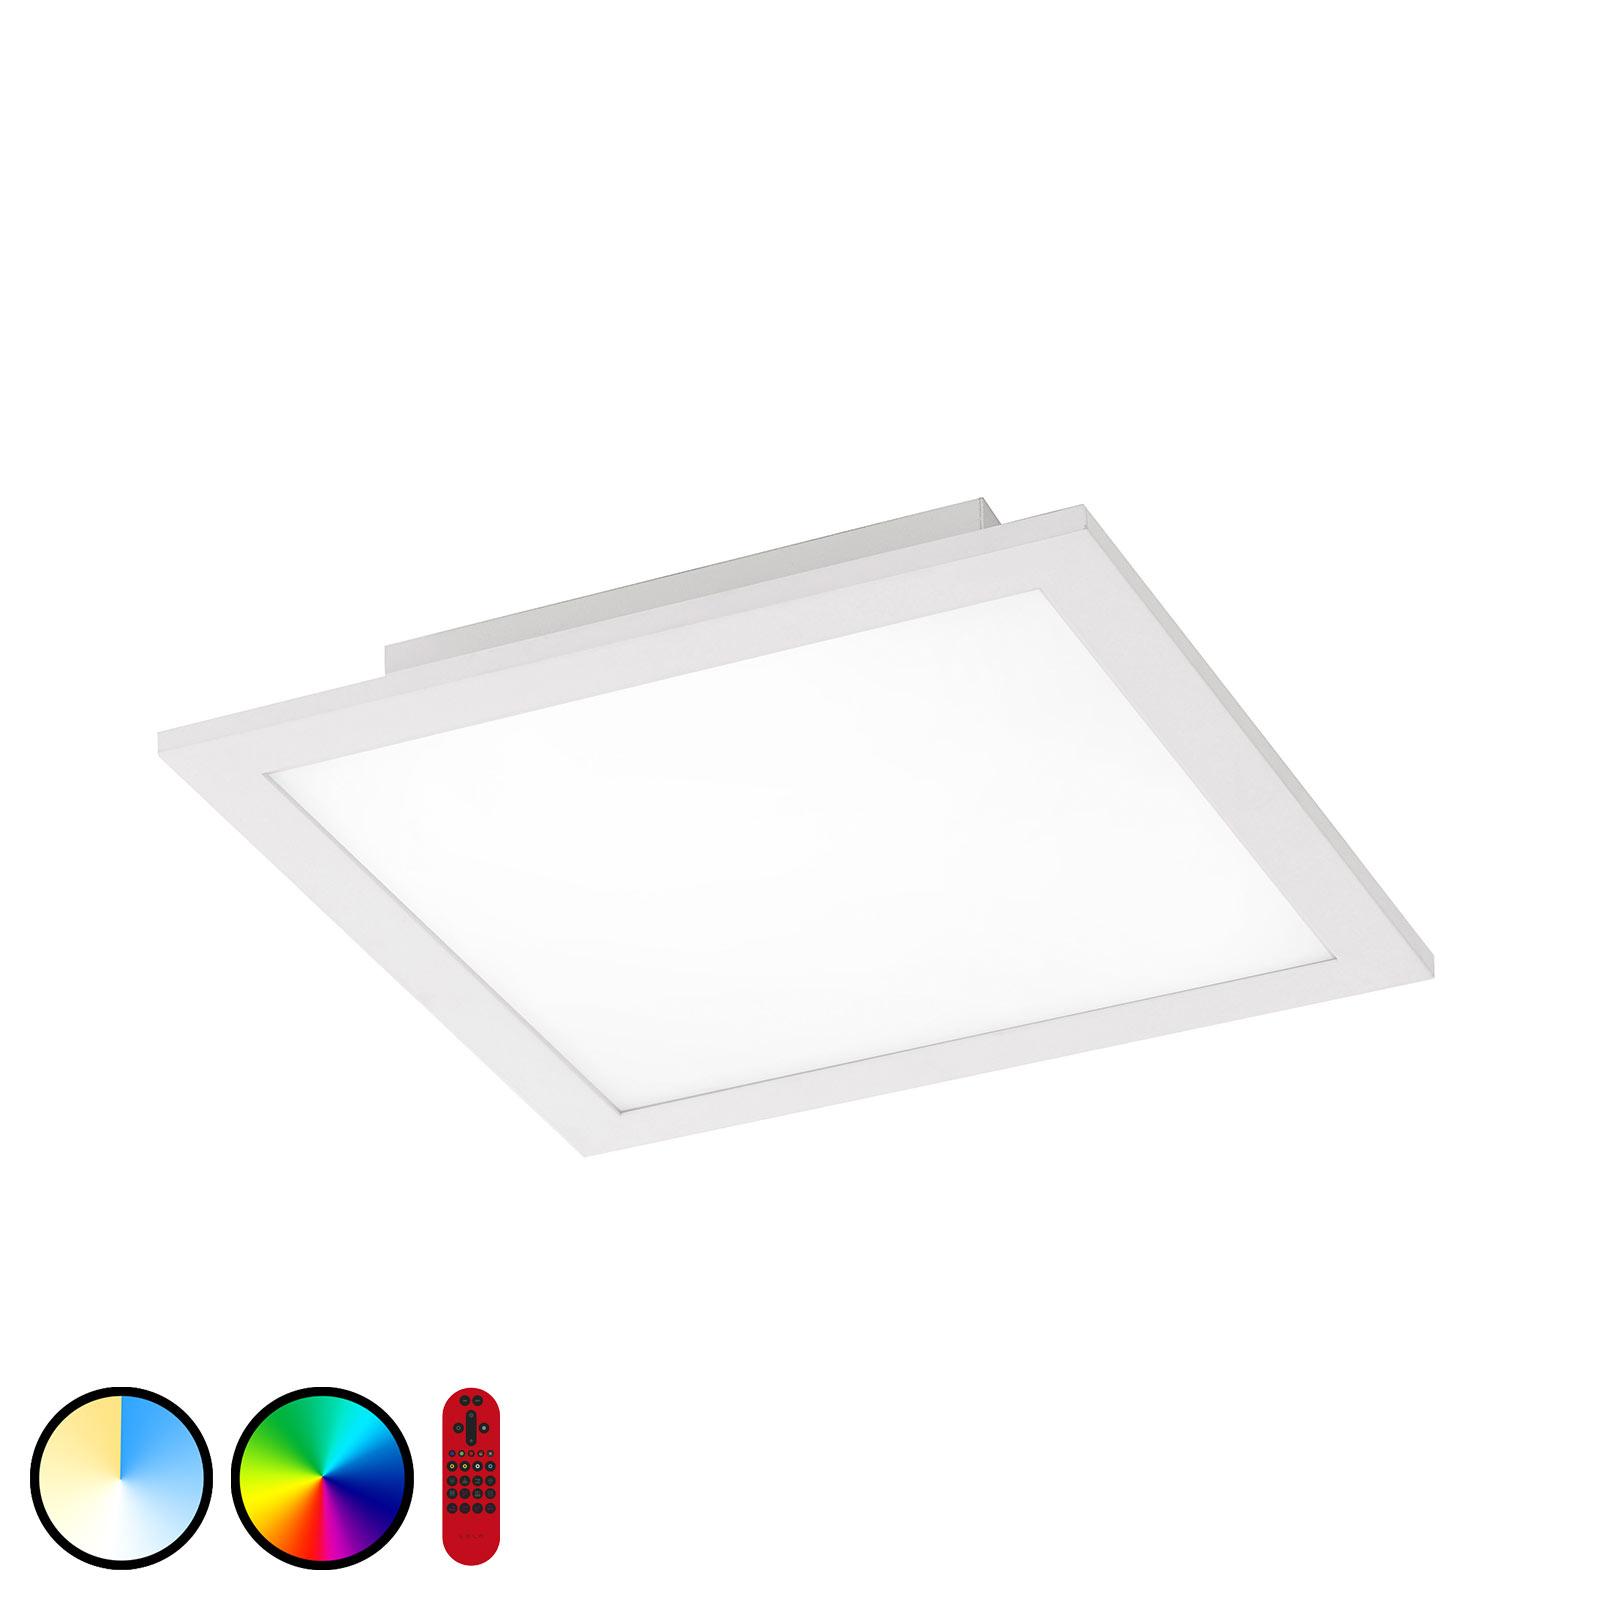 LED-taklampa LOLASmart Flat, 30 x 30 cm